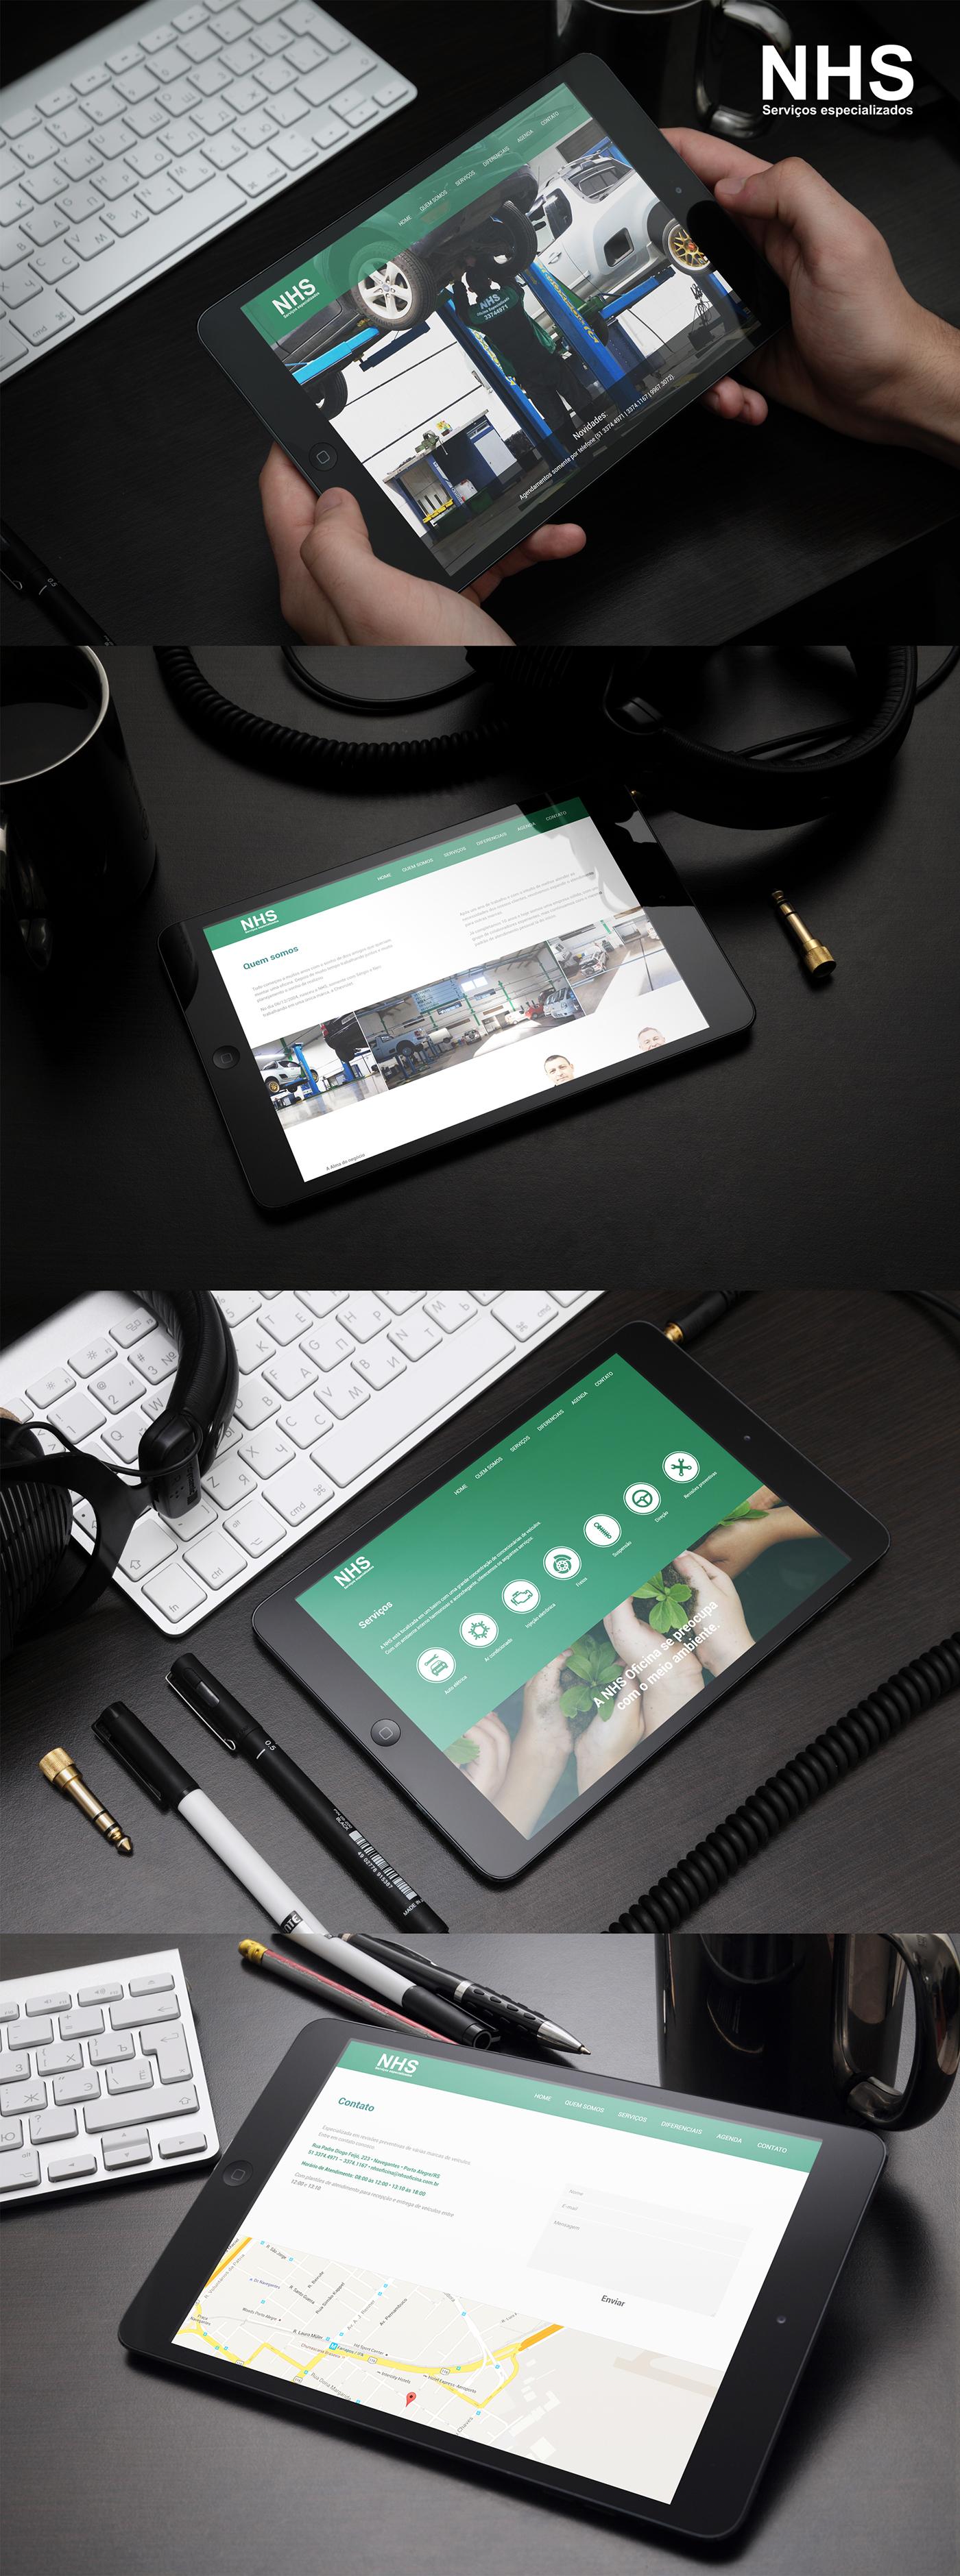 oficina nhs serviços Mecanica Interface Website parallax